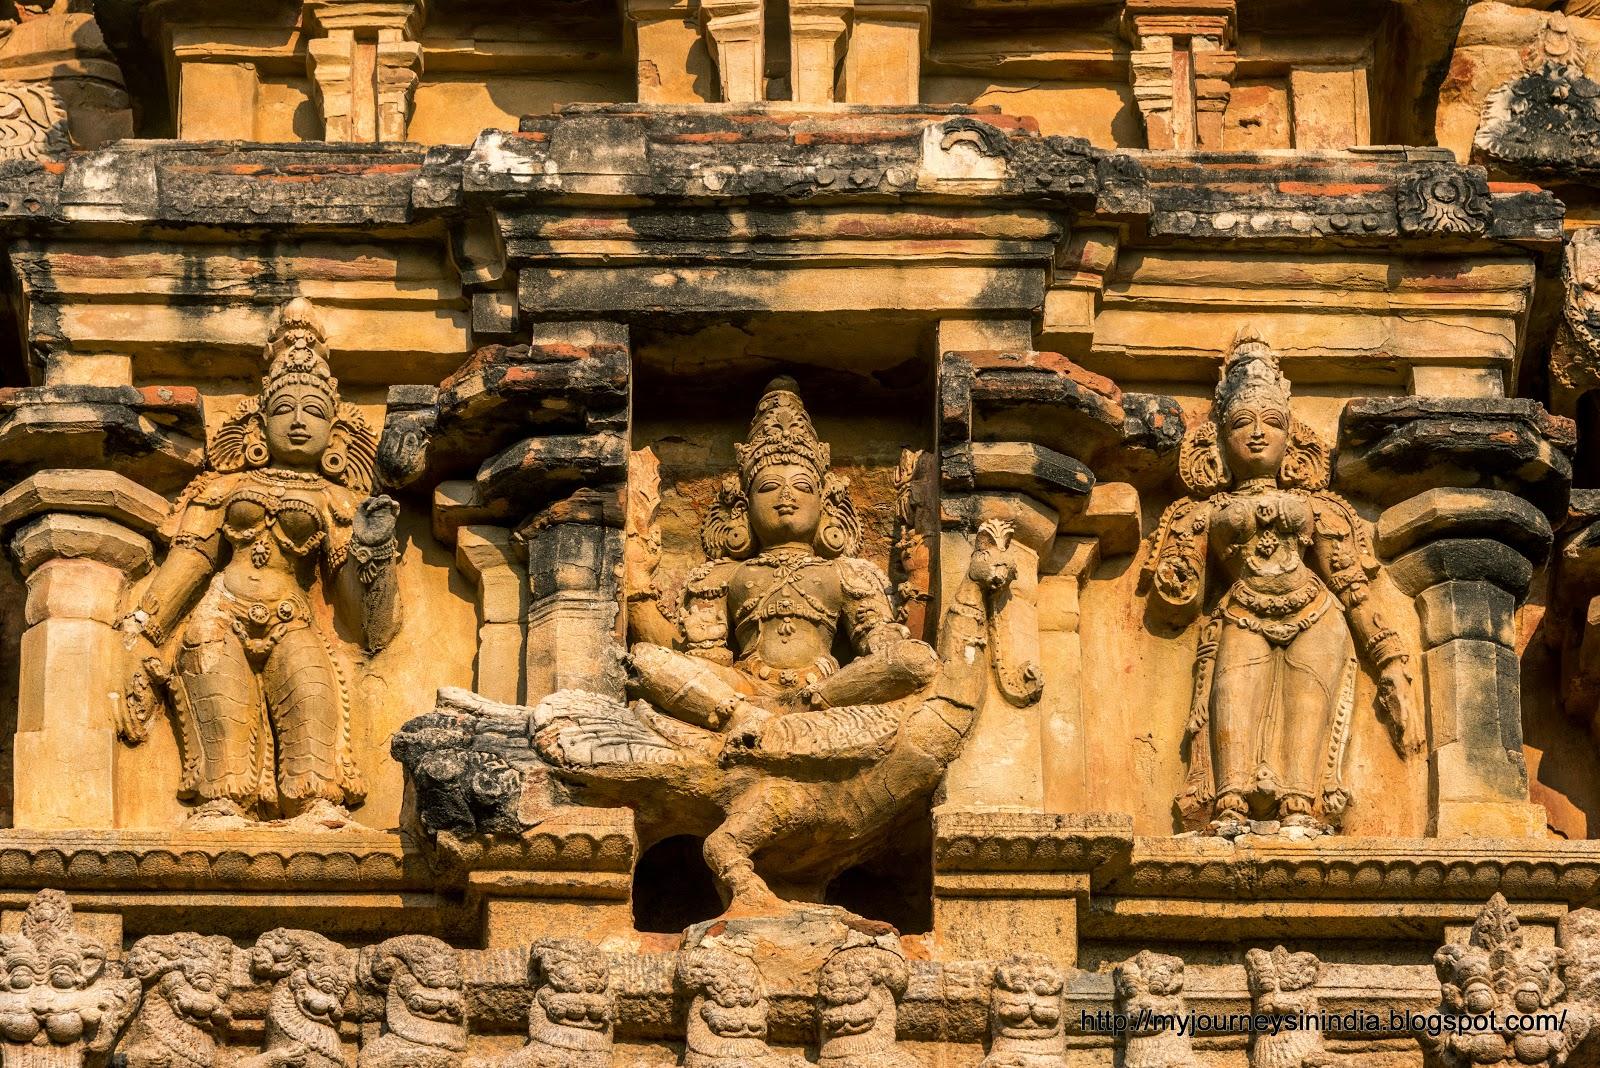 Thanjavur Brihadeeswarar Temple Tower Subramanya Valli Deivanai